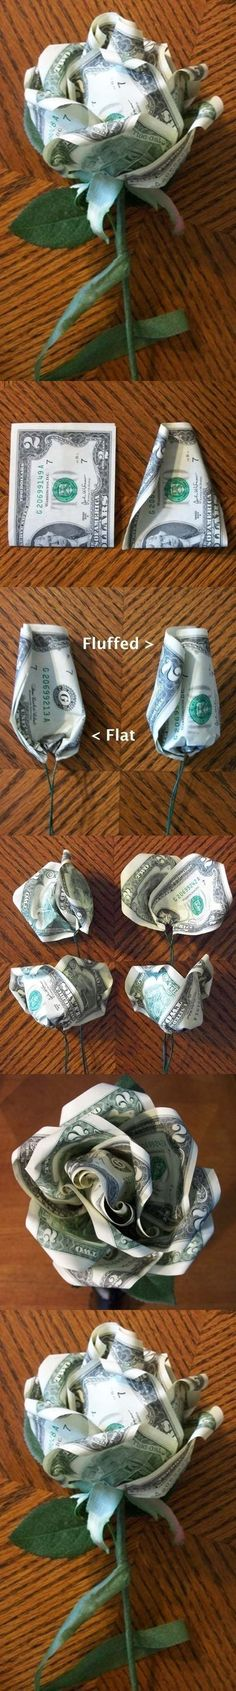 DIY Dollar Rose   www.FabArtDIY.com LIKE Us on Facebook ==> https://www.facebook.com/FabArtDIY